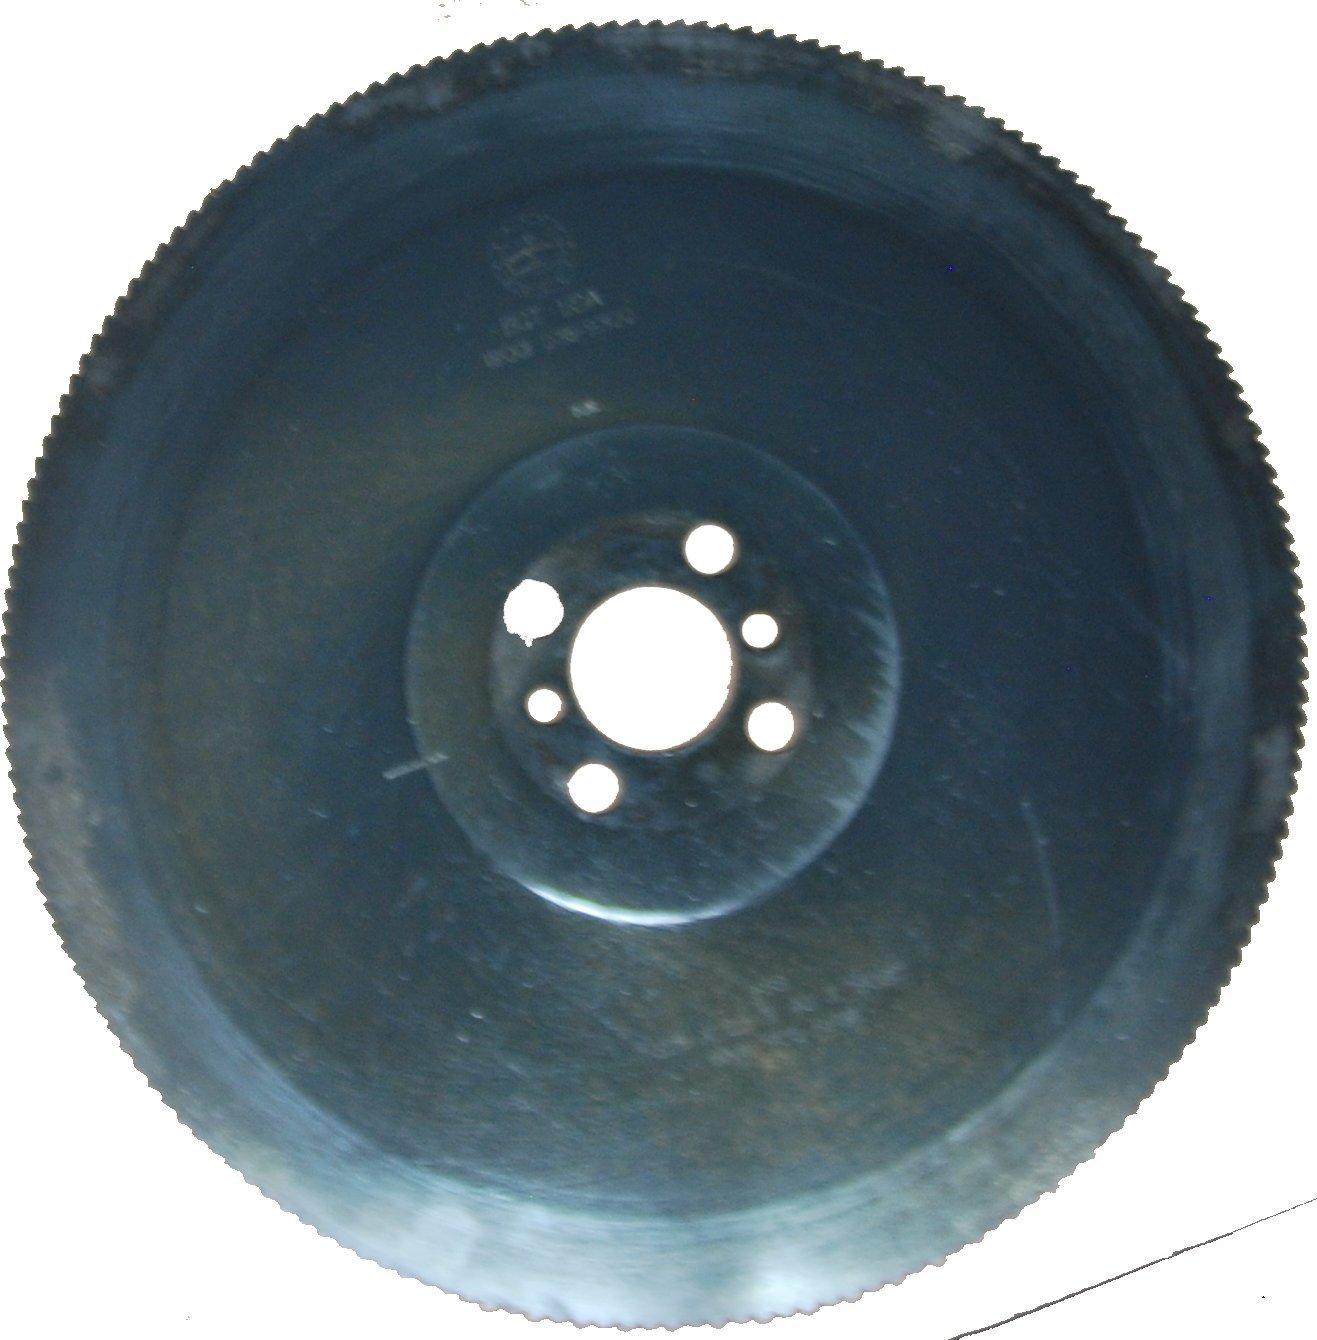 KR CUTTING TOOLS 14 X .093 X 1 X 266B HSS Circular Cold Saw Blade KR Cutting Tools